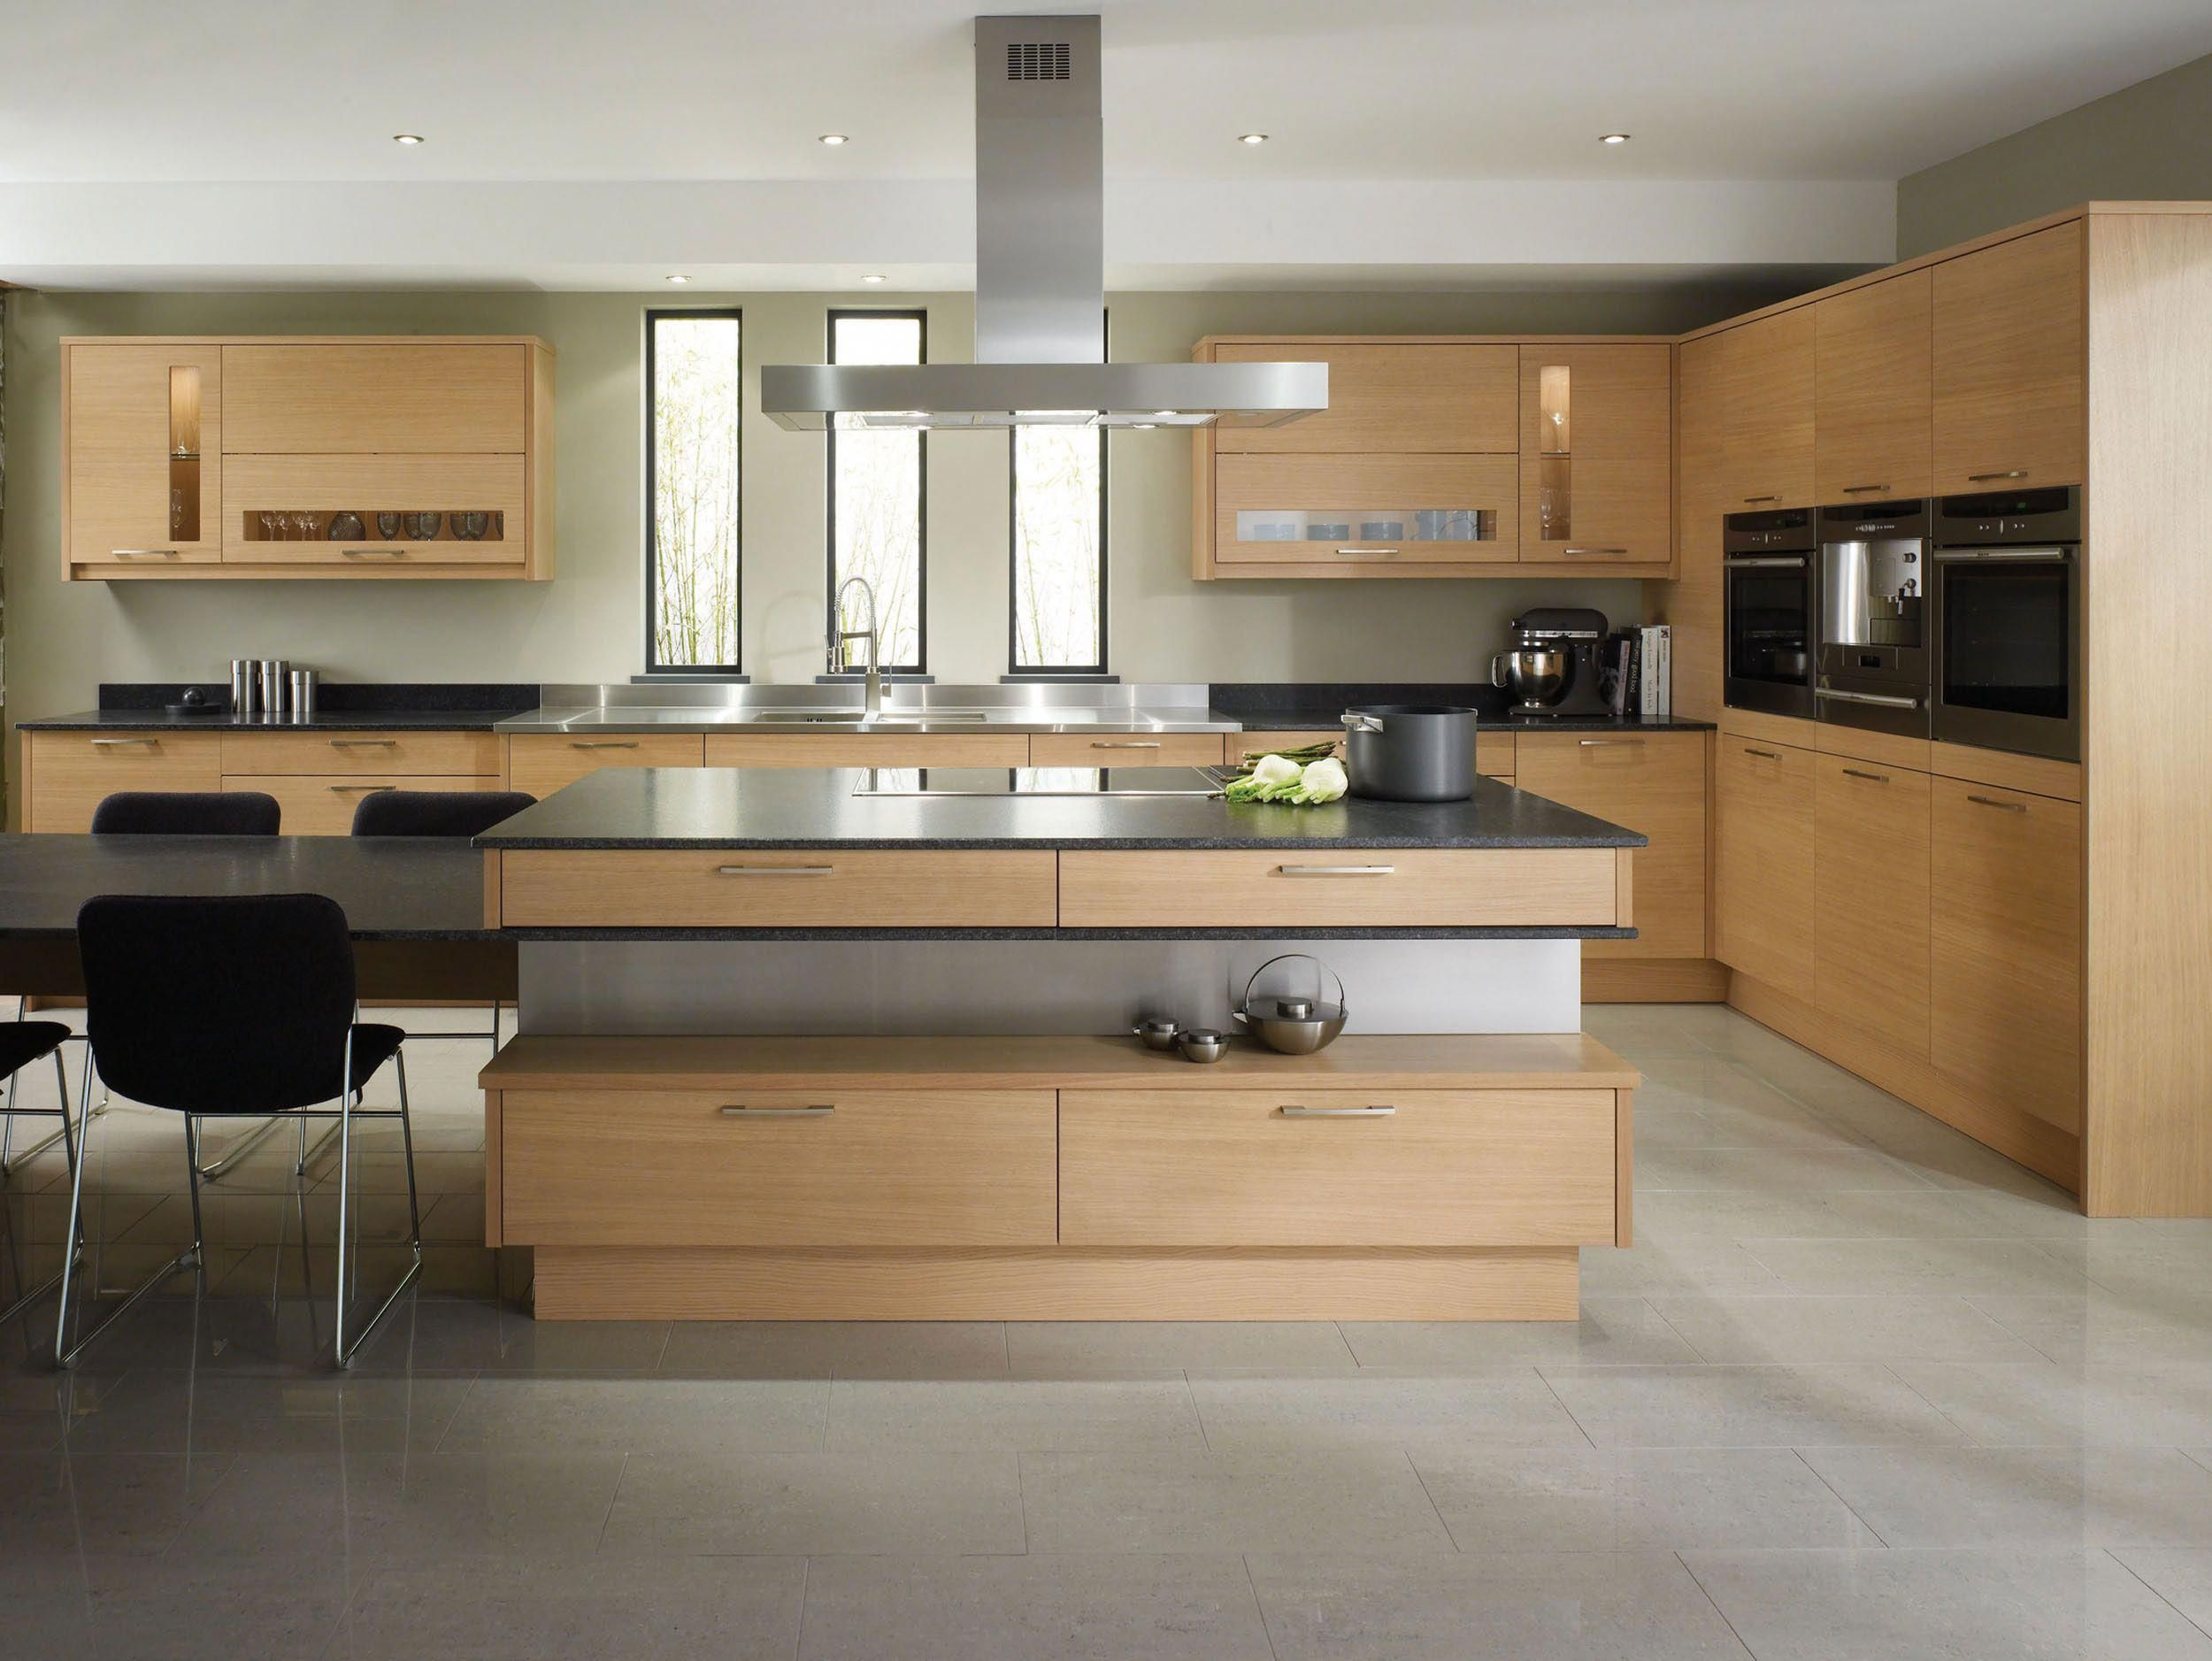 Contemporary ideas for above kitchen cabinets kcn kitchendesignideas also rh pinterest